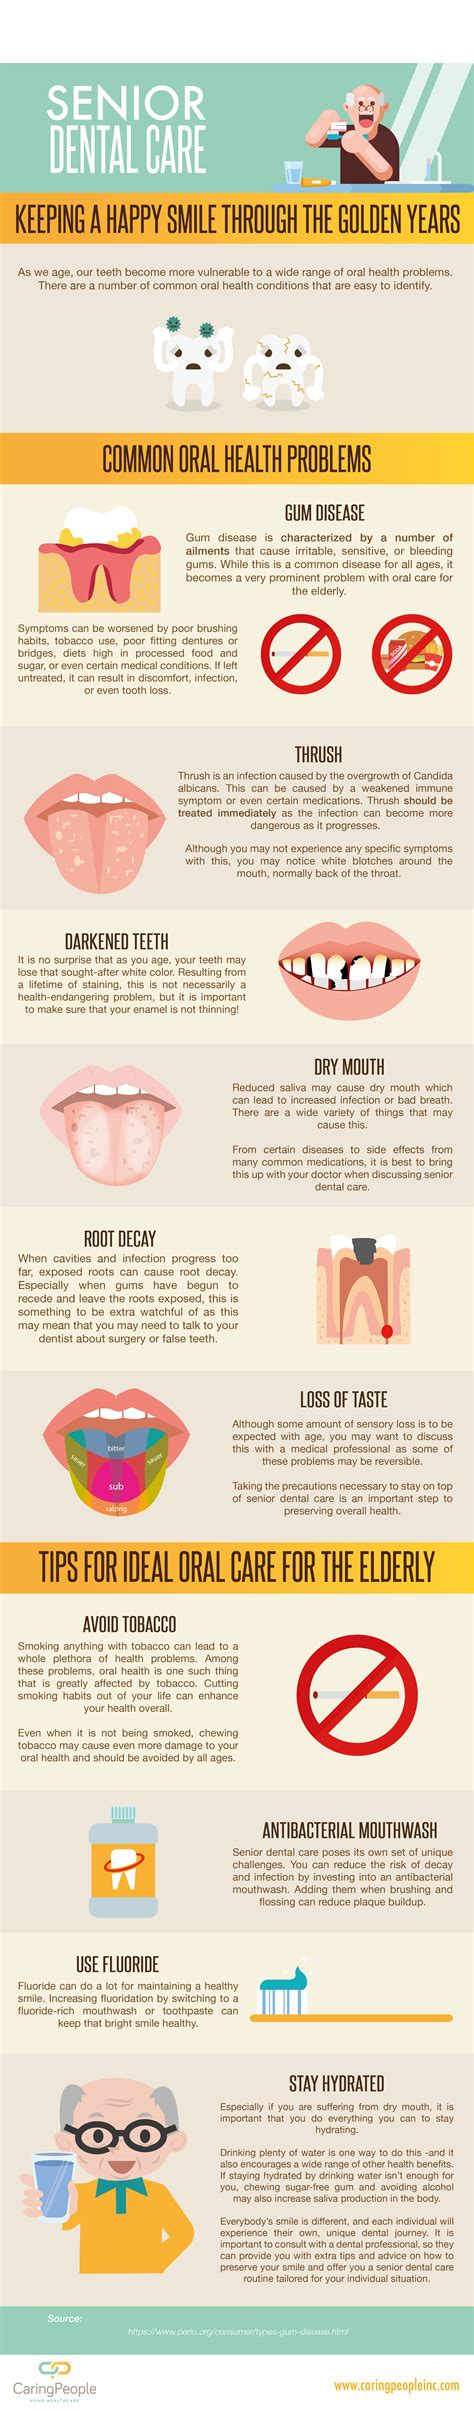 Senior Dental Care Keeping A Happy Smile Through The